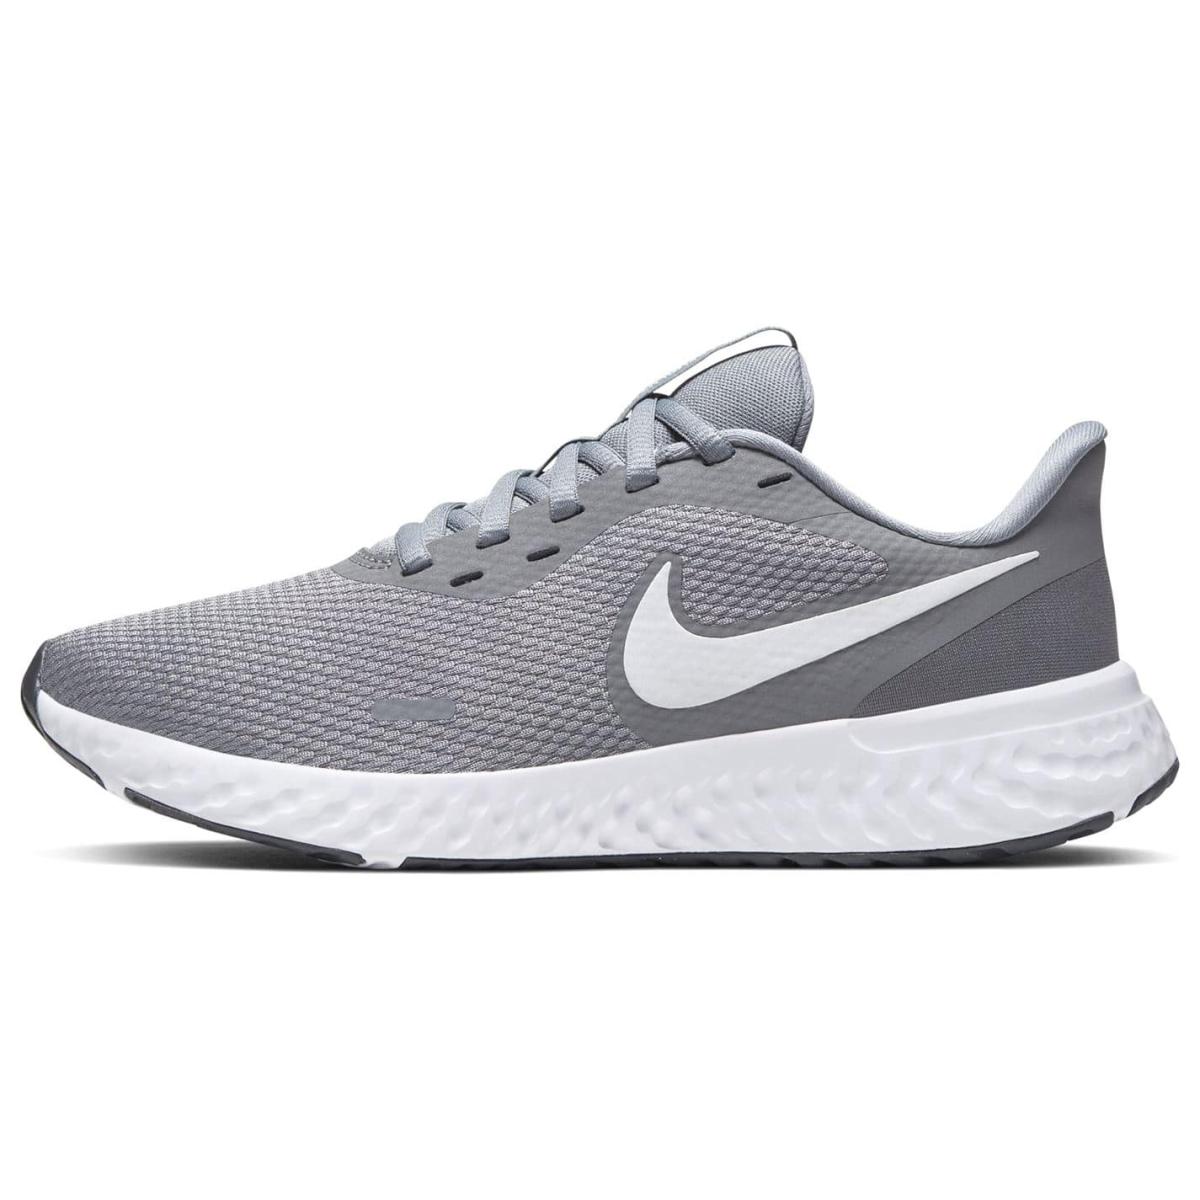 Nike-Revolution-Turnschuhe-Damen-Sneaker-Sportschuhe-Laufschuhe-1160 Indexbild 26